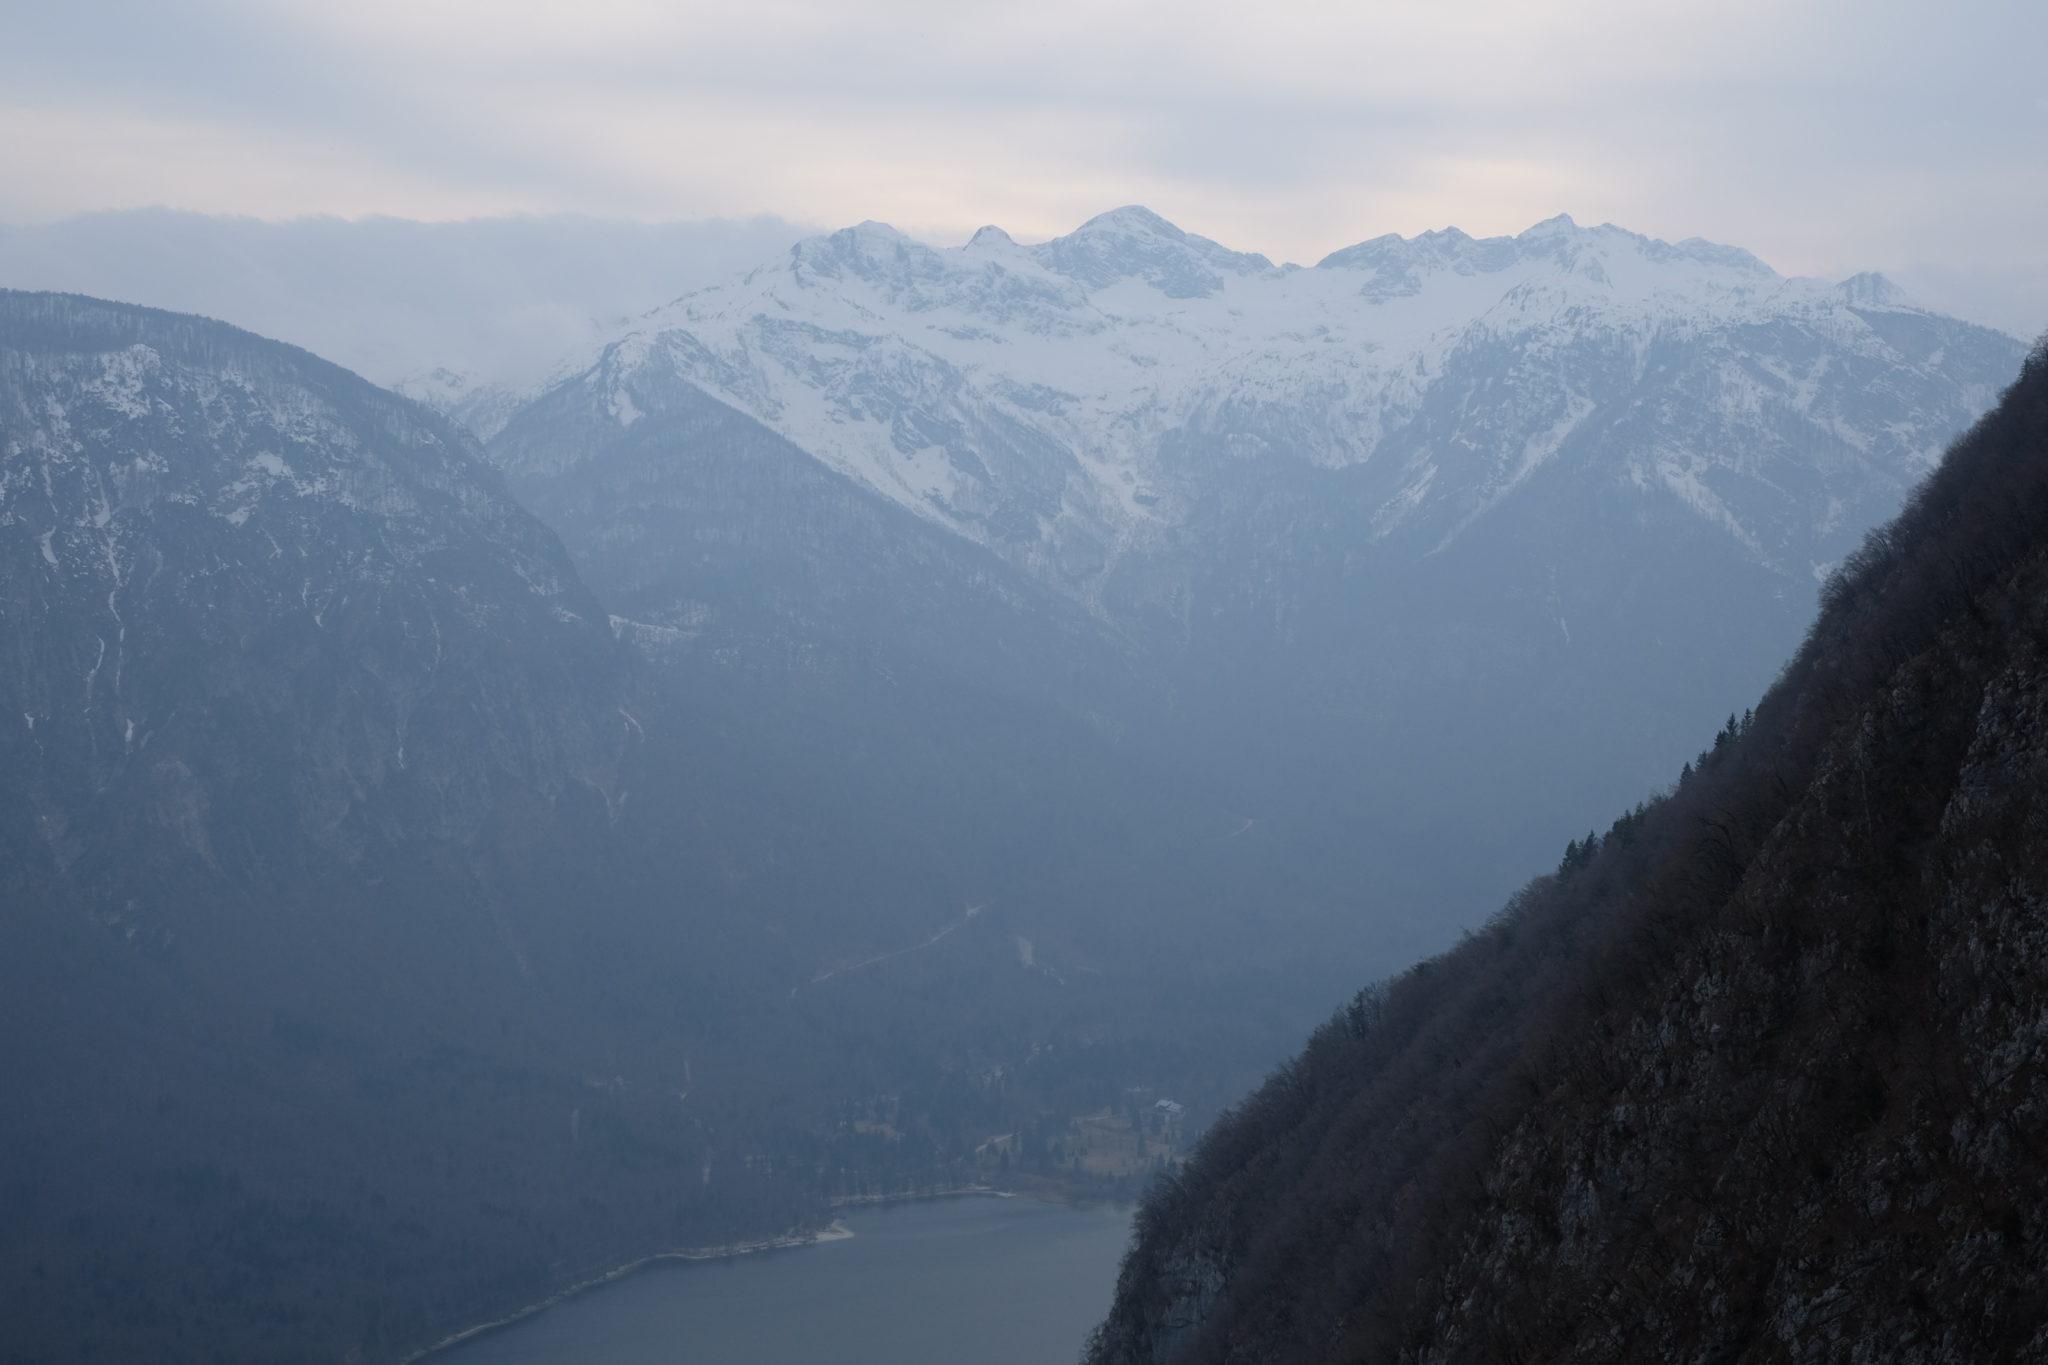 My top Instagram photo point over Lake Bohinj from Vogar. Slovenia